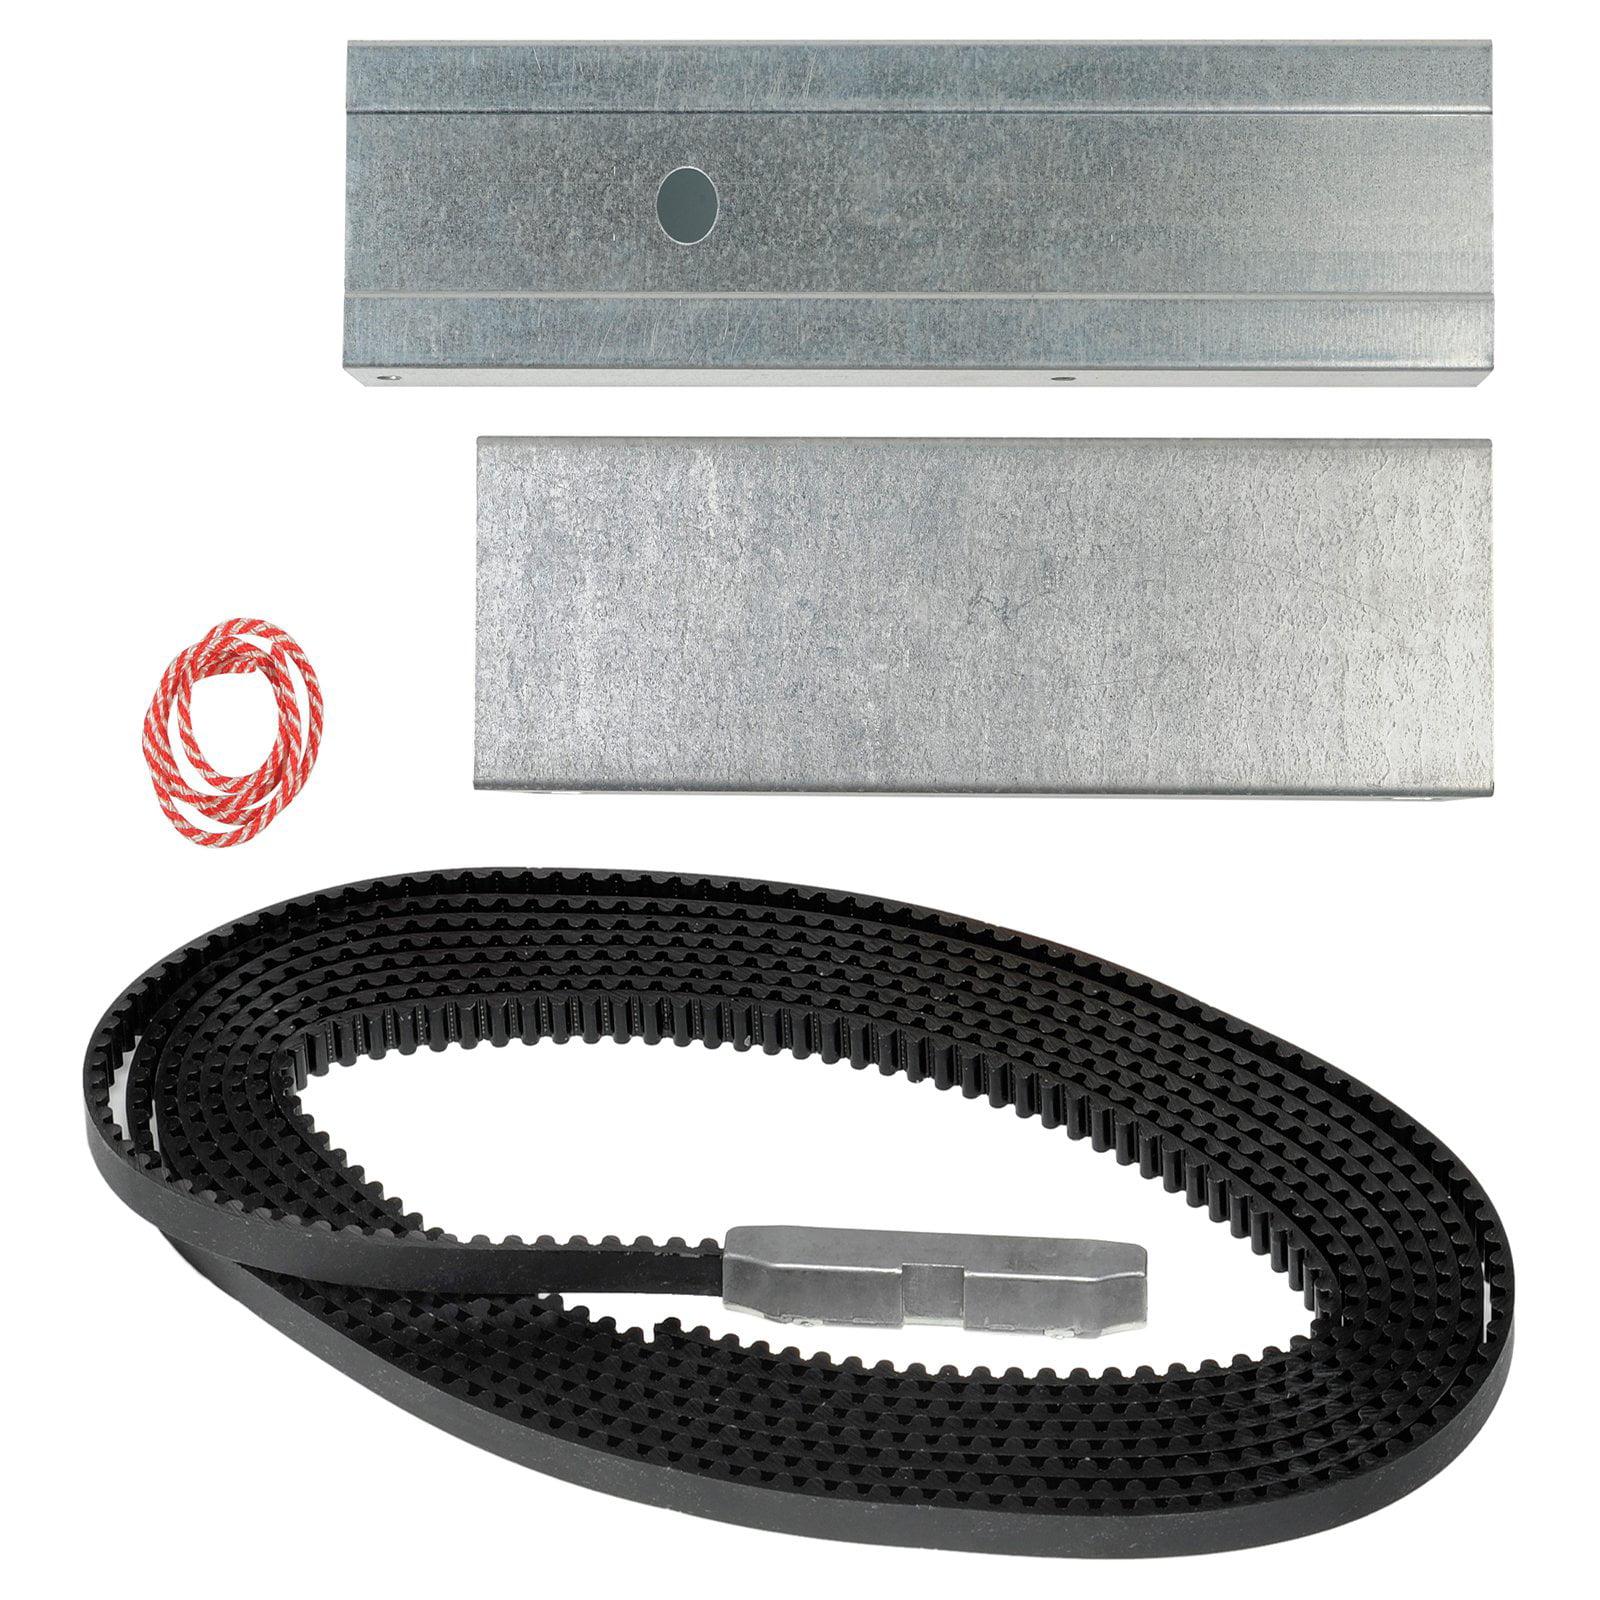 Genie 37302r C-Channel Belt Extension Kit